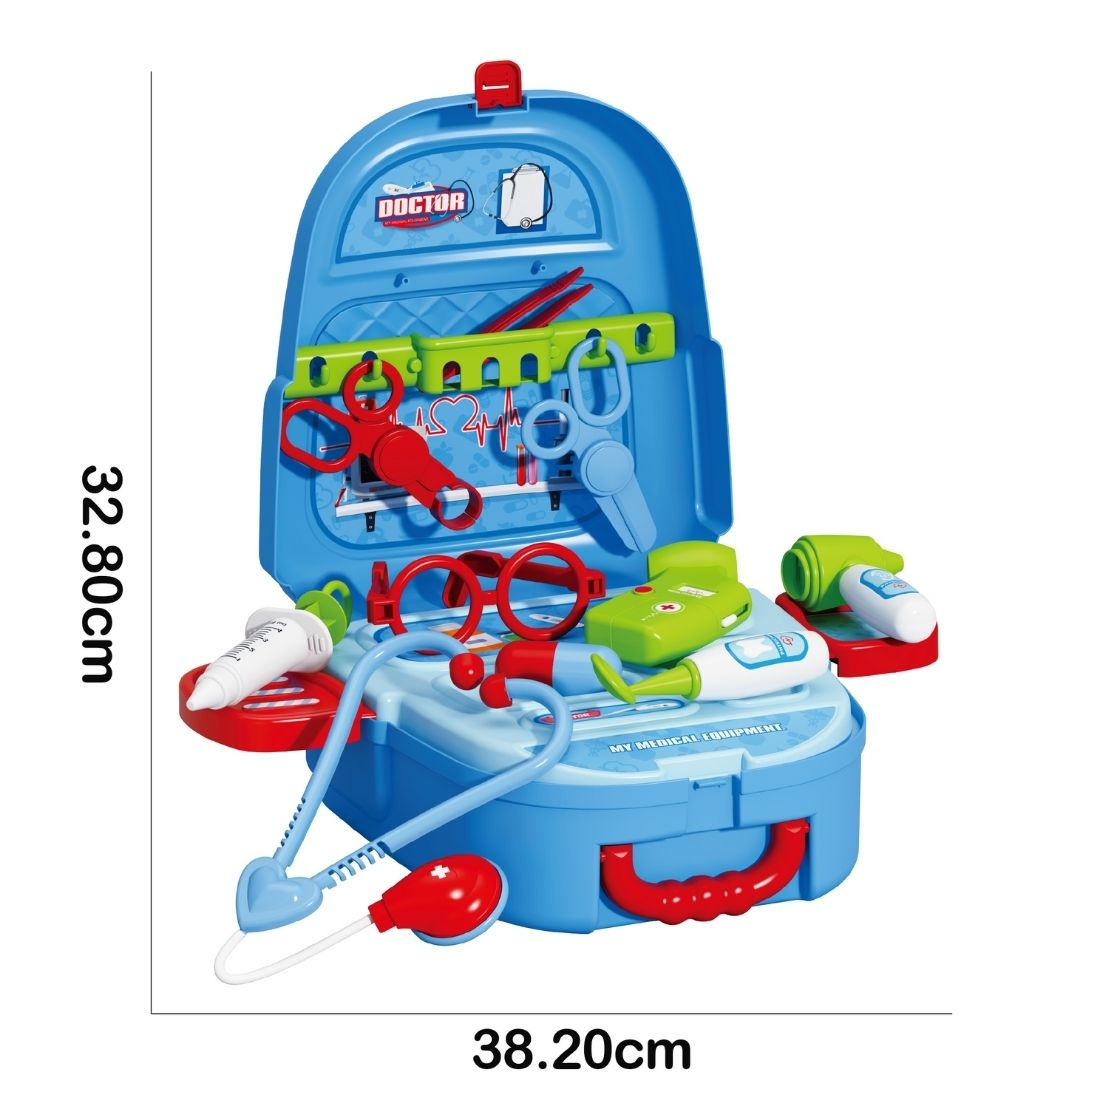 Brinquedo Mochila Kit Médico Maleta Infantil 2 em 1 Completo